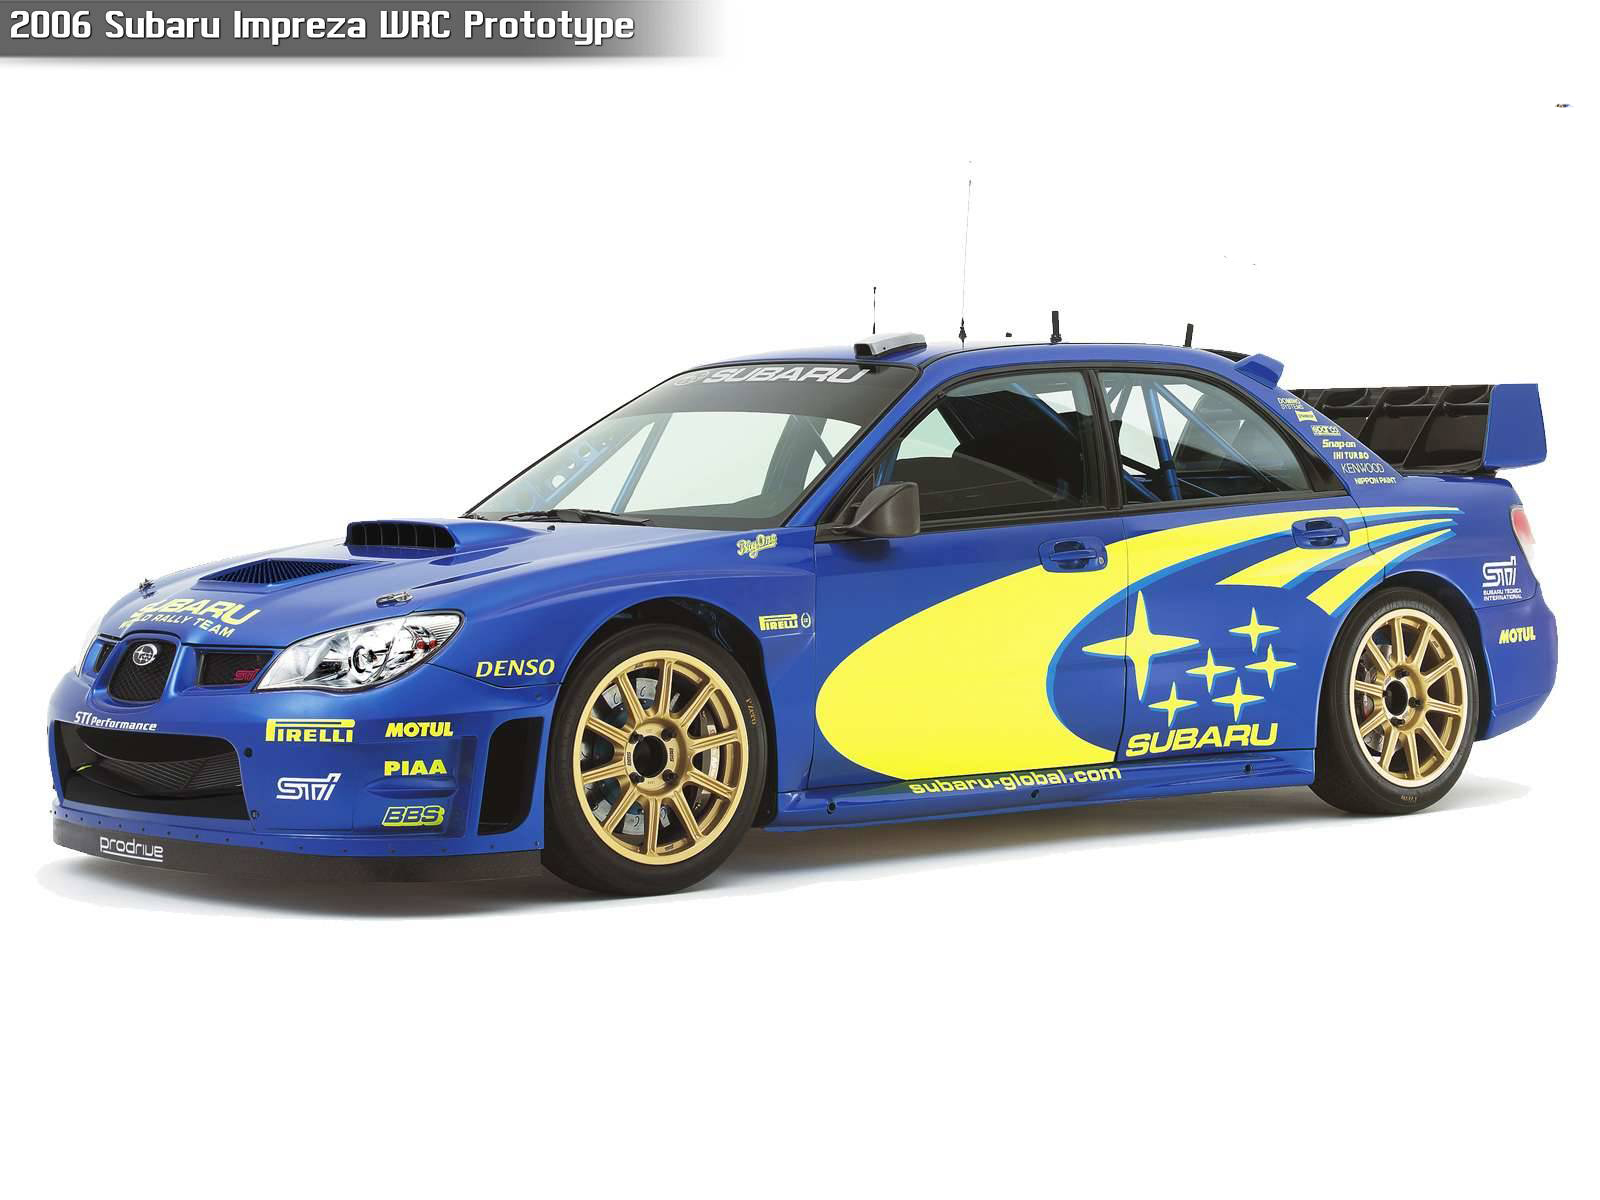 Subaru-Impreza_WRC_Prototype-2006-1600-02.jpg